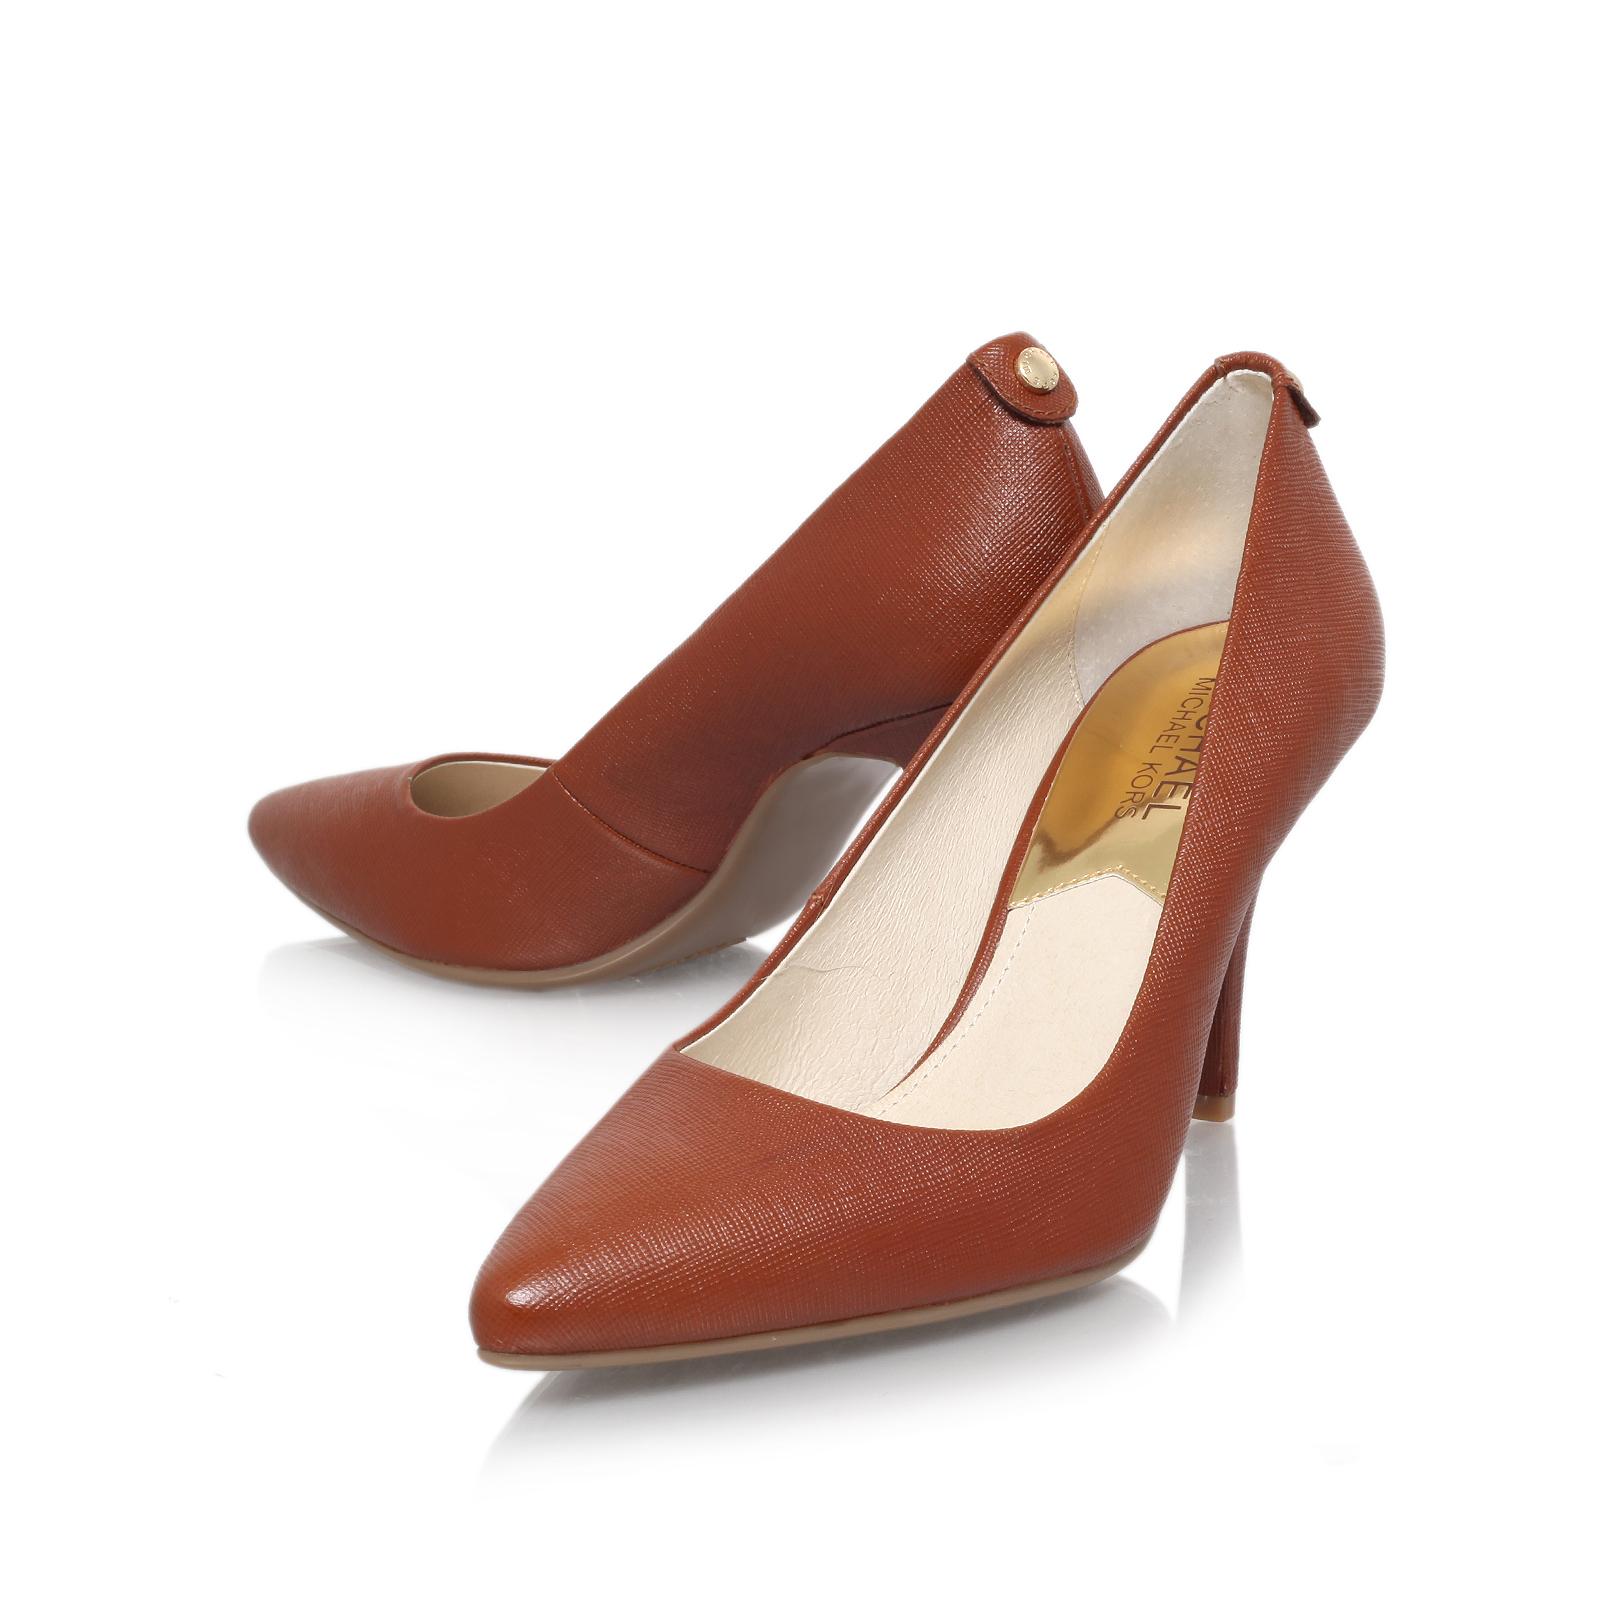 High Heel Court Shoes Uk